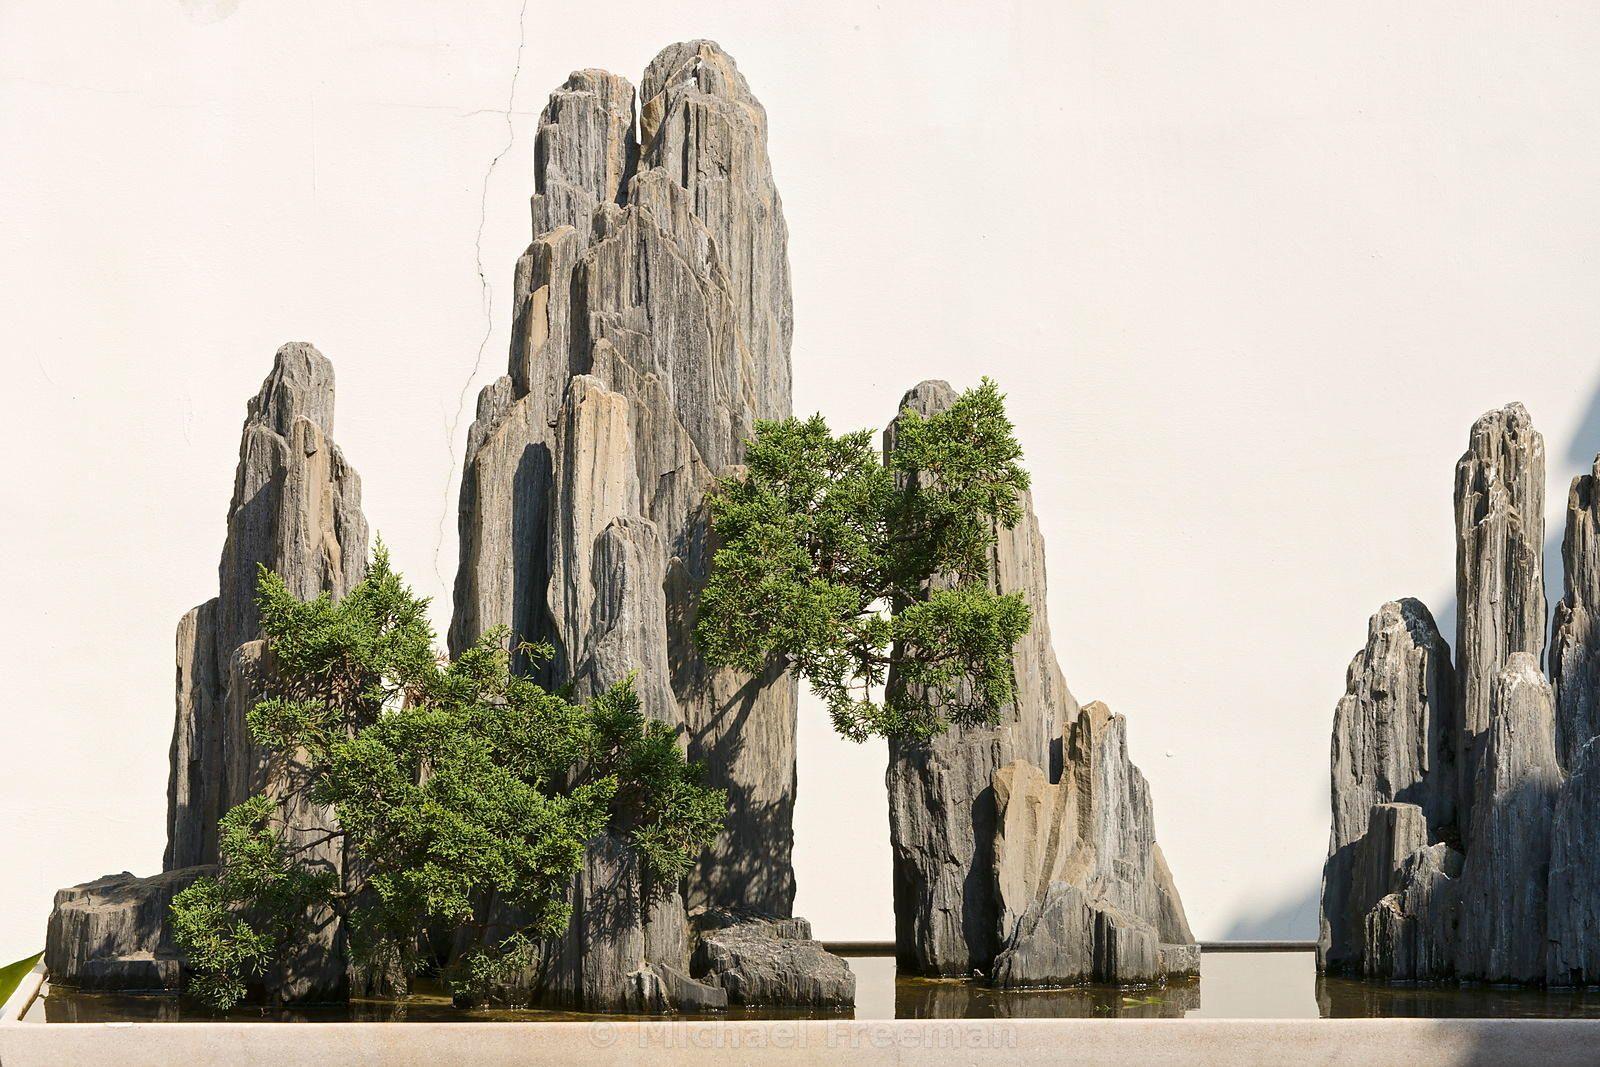 19692 84 Penjing Uxga Jpg 1600×1067 Suzhou Museum 640 x 480